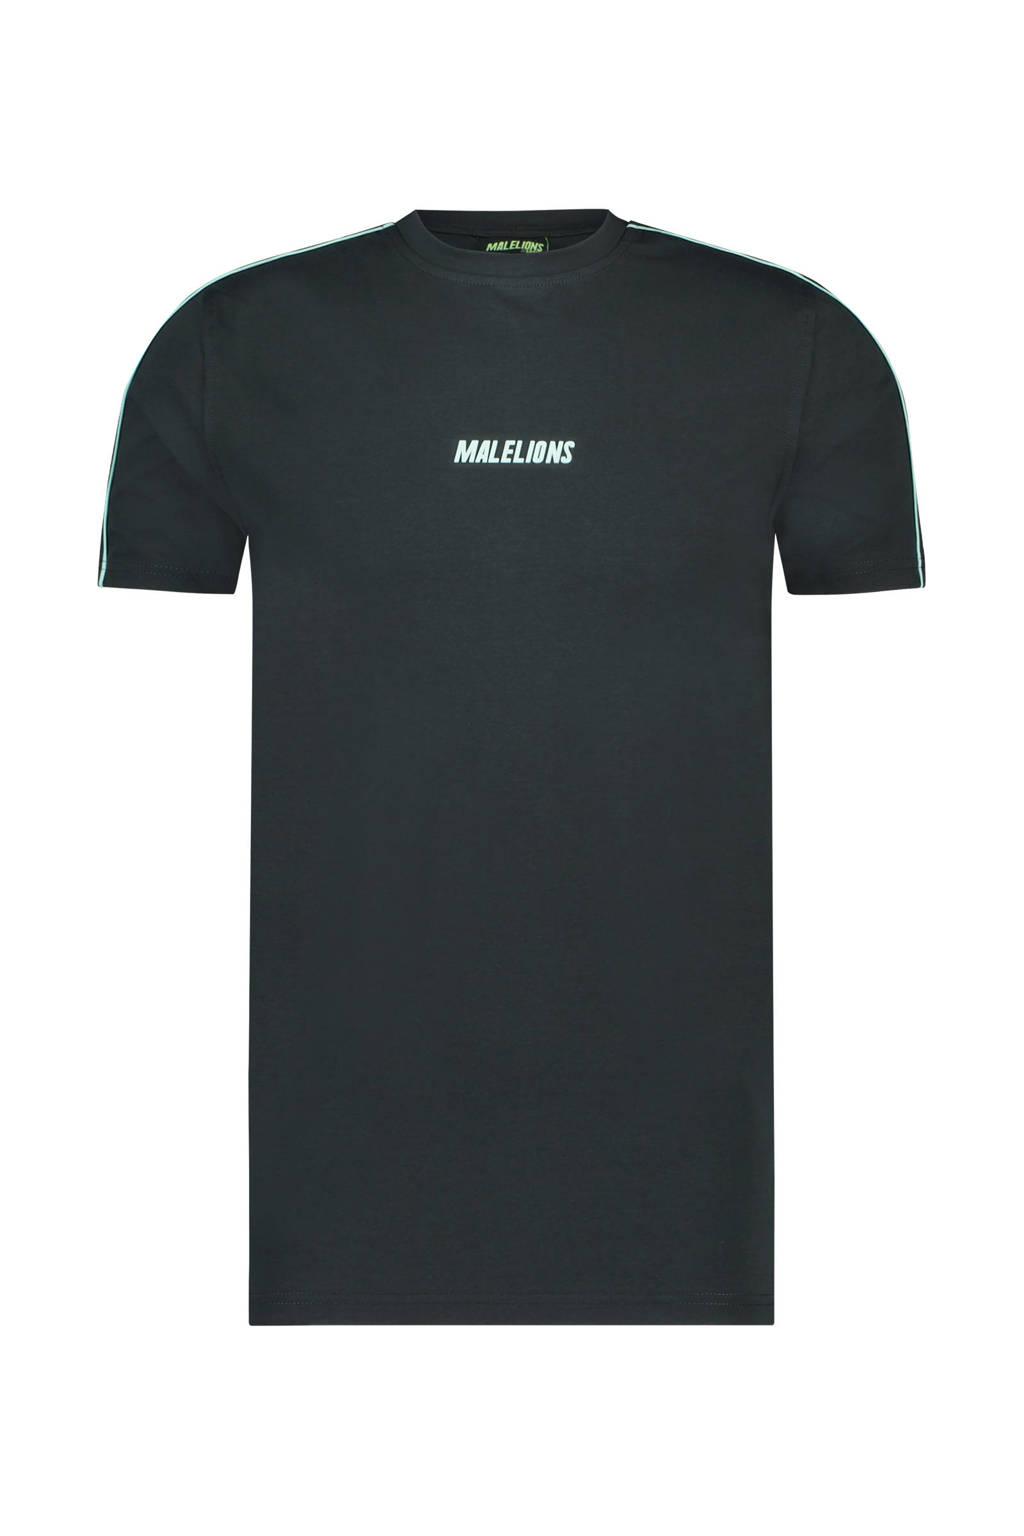 Malelions T-shirt Coach antraciet/mint, Antraciet/mintgroen